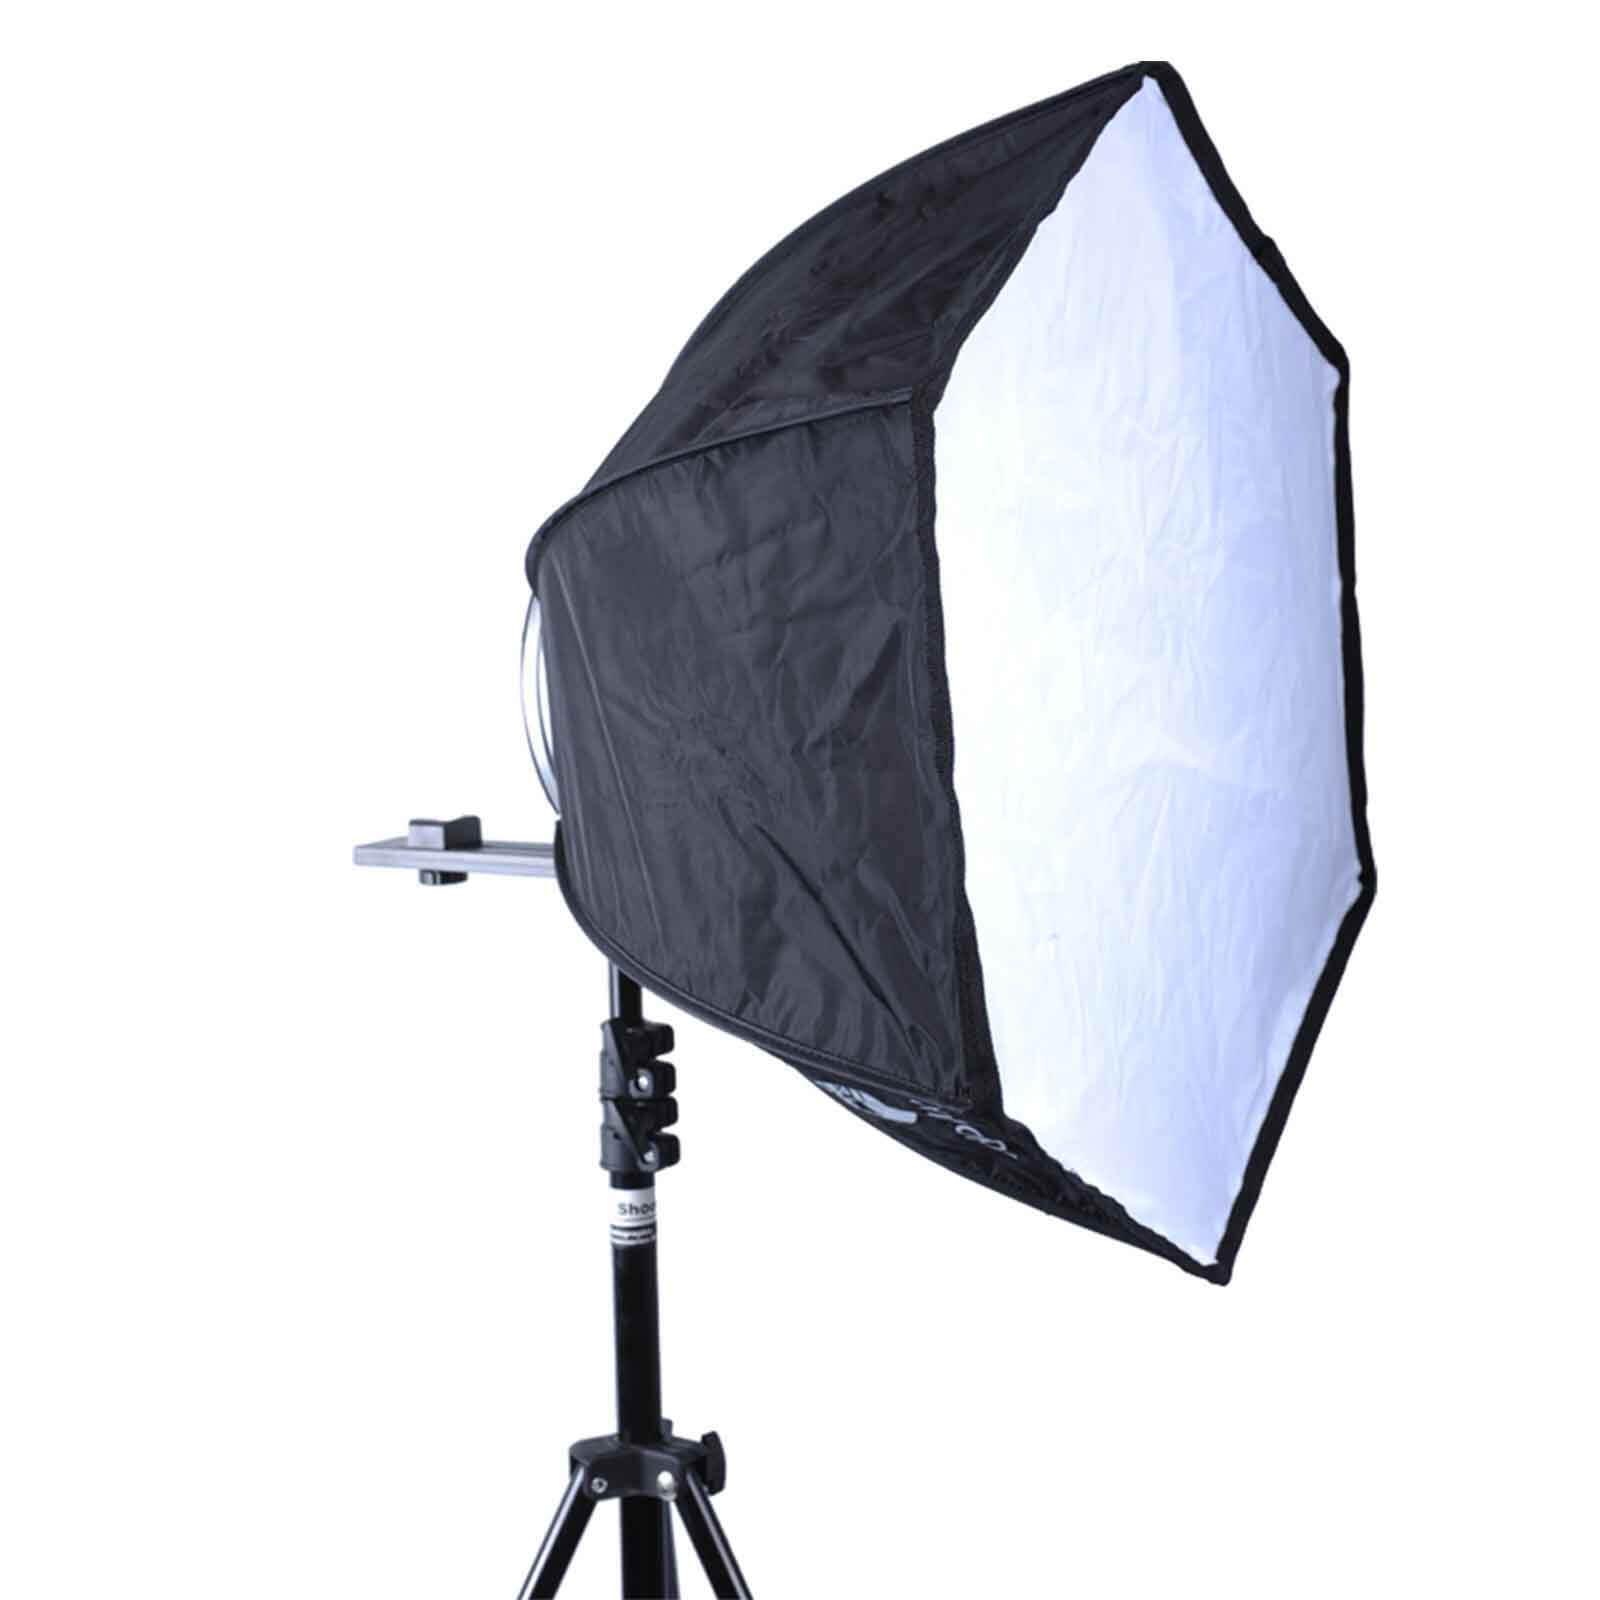 46cm Foldable Speedlite Flash Softbox Diffuser Reflector for Studio Light Stand